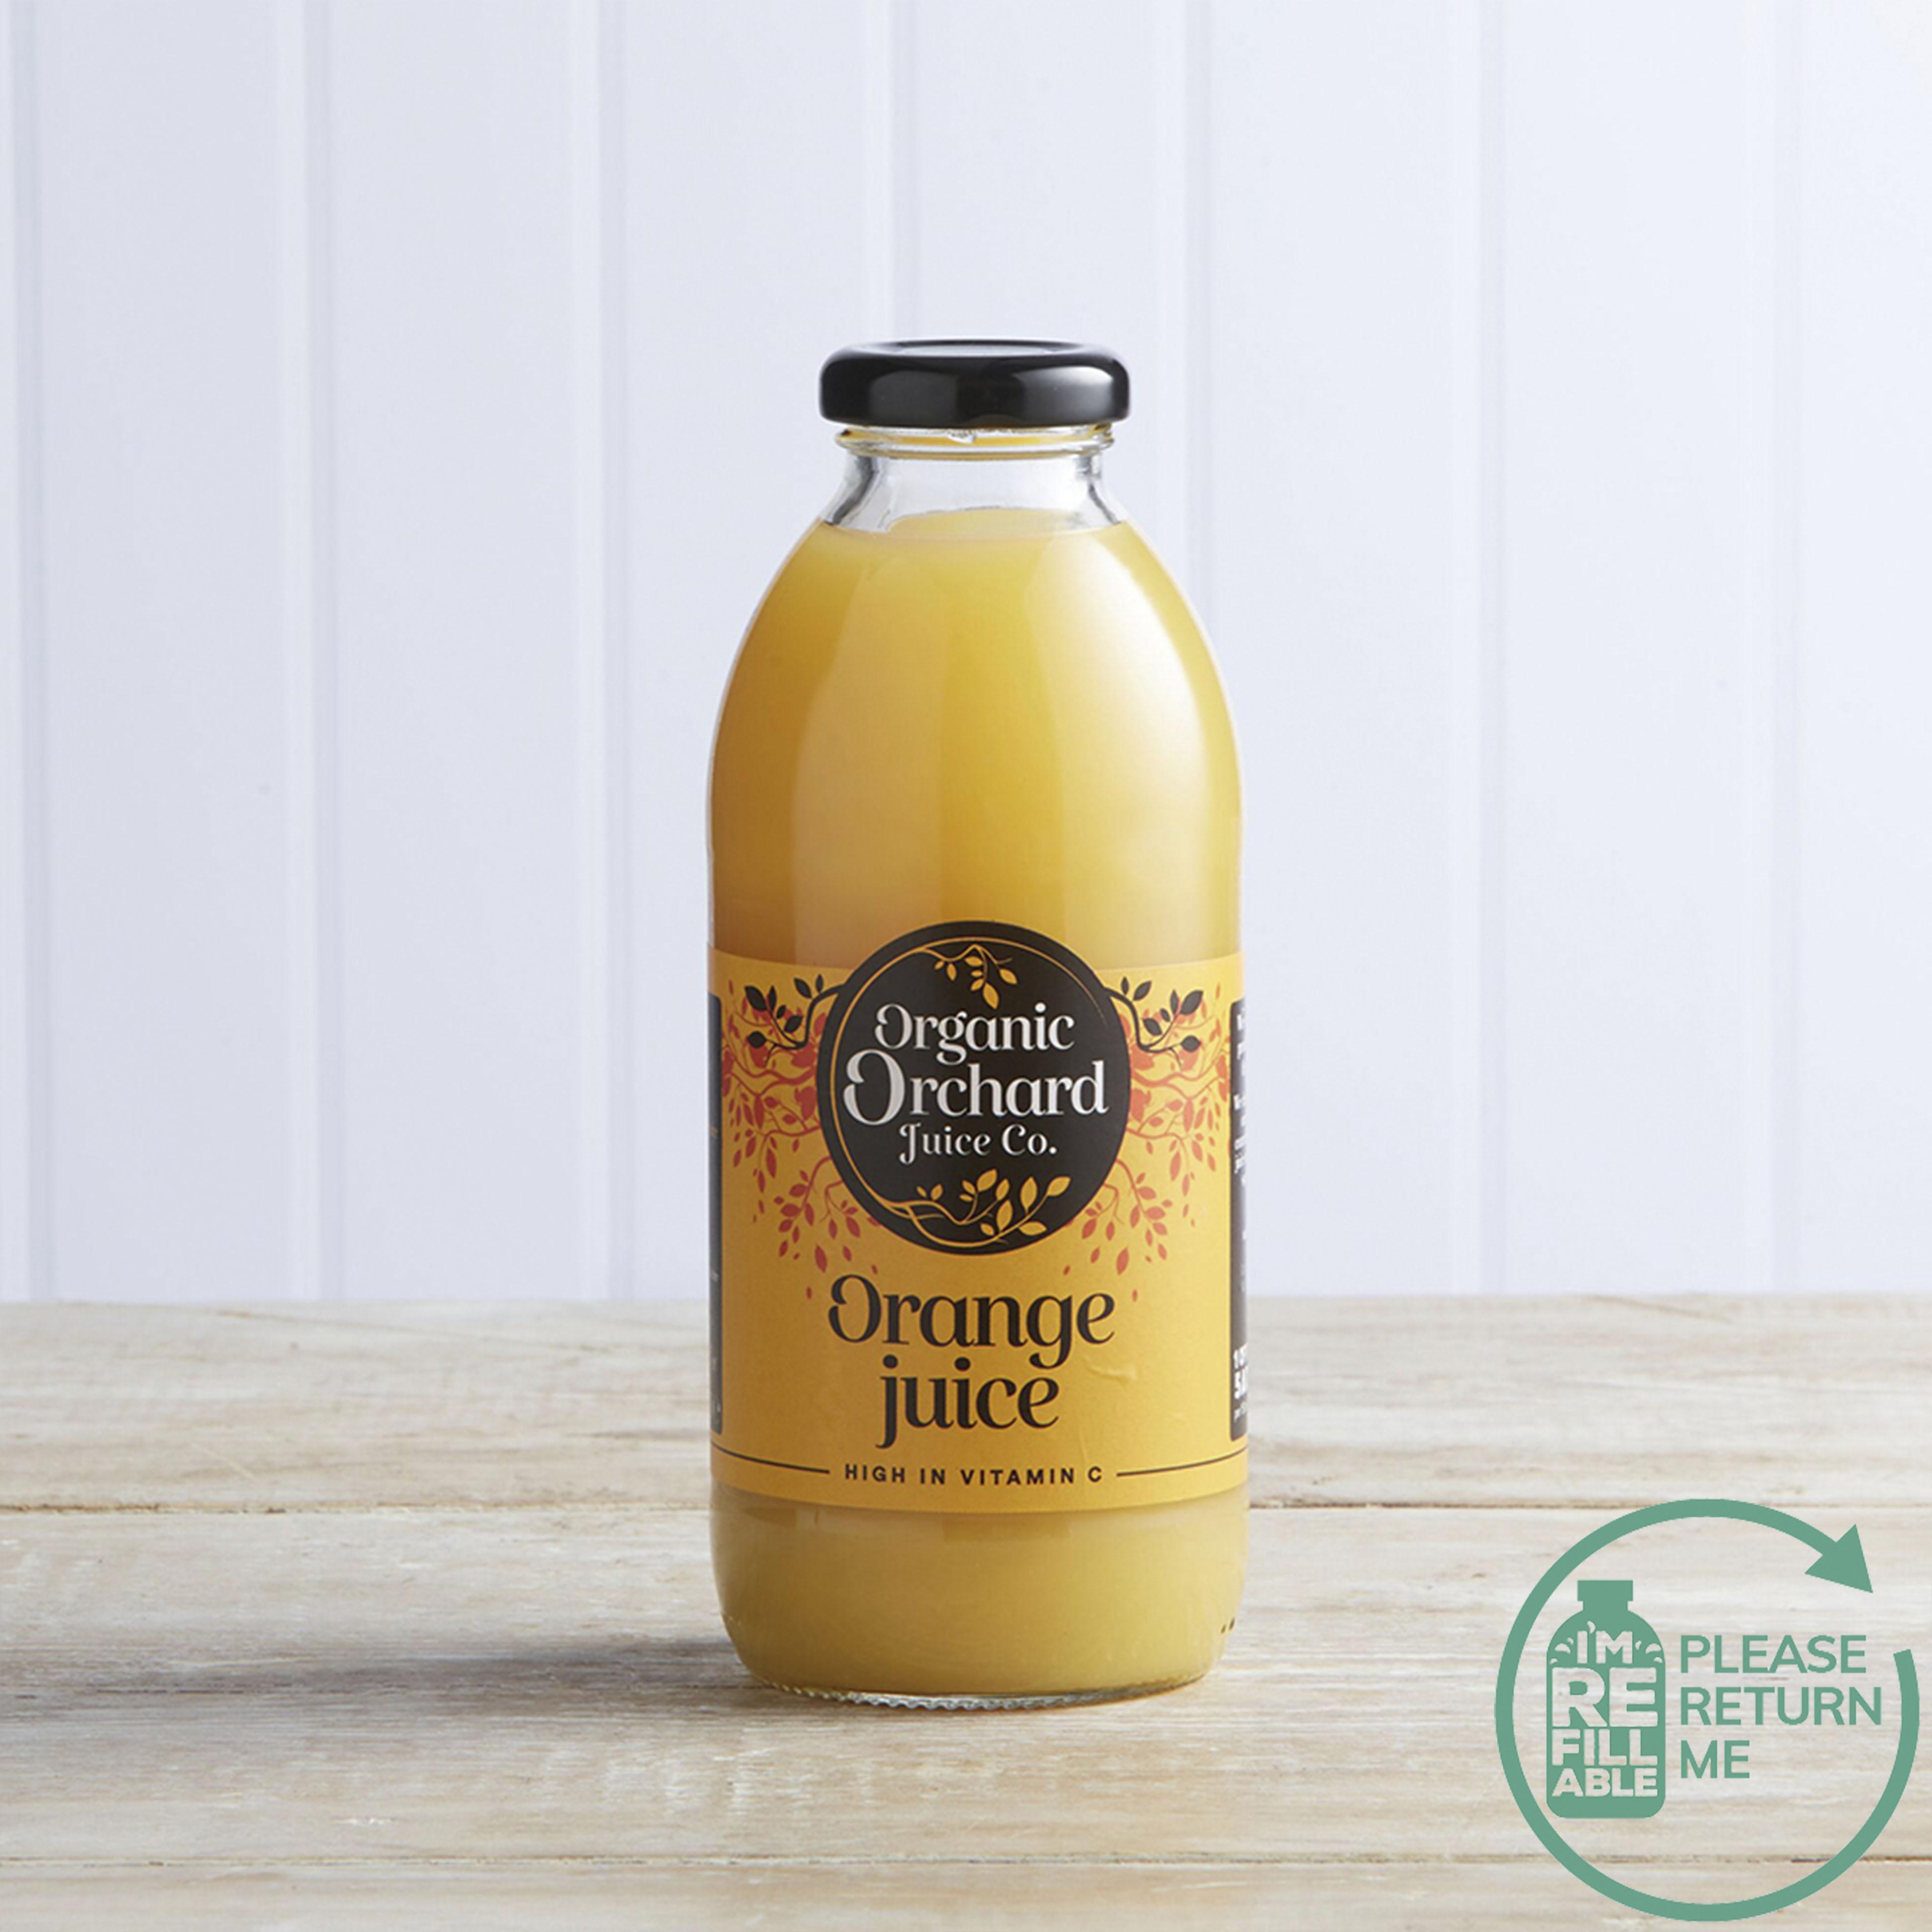 Organic Orchard Juice Co. Orange Juice in Glass, 500ml